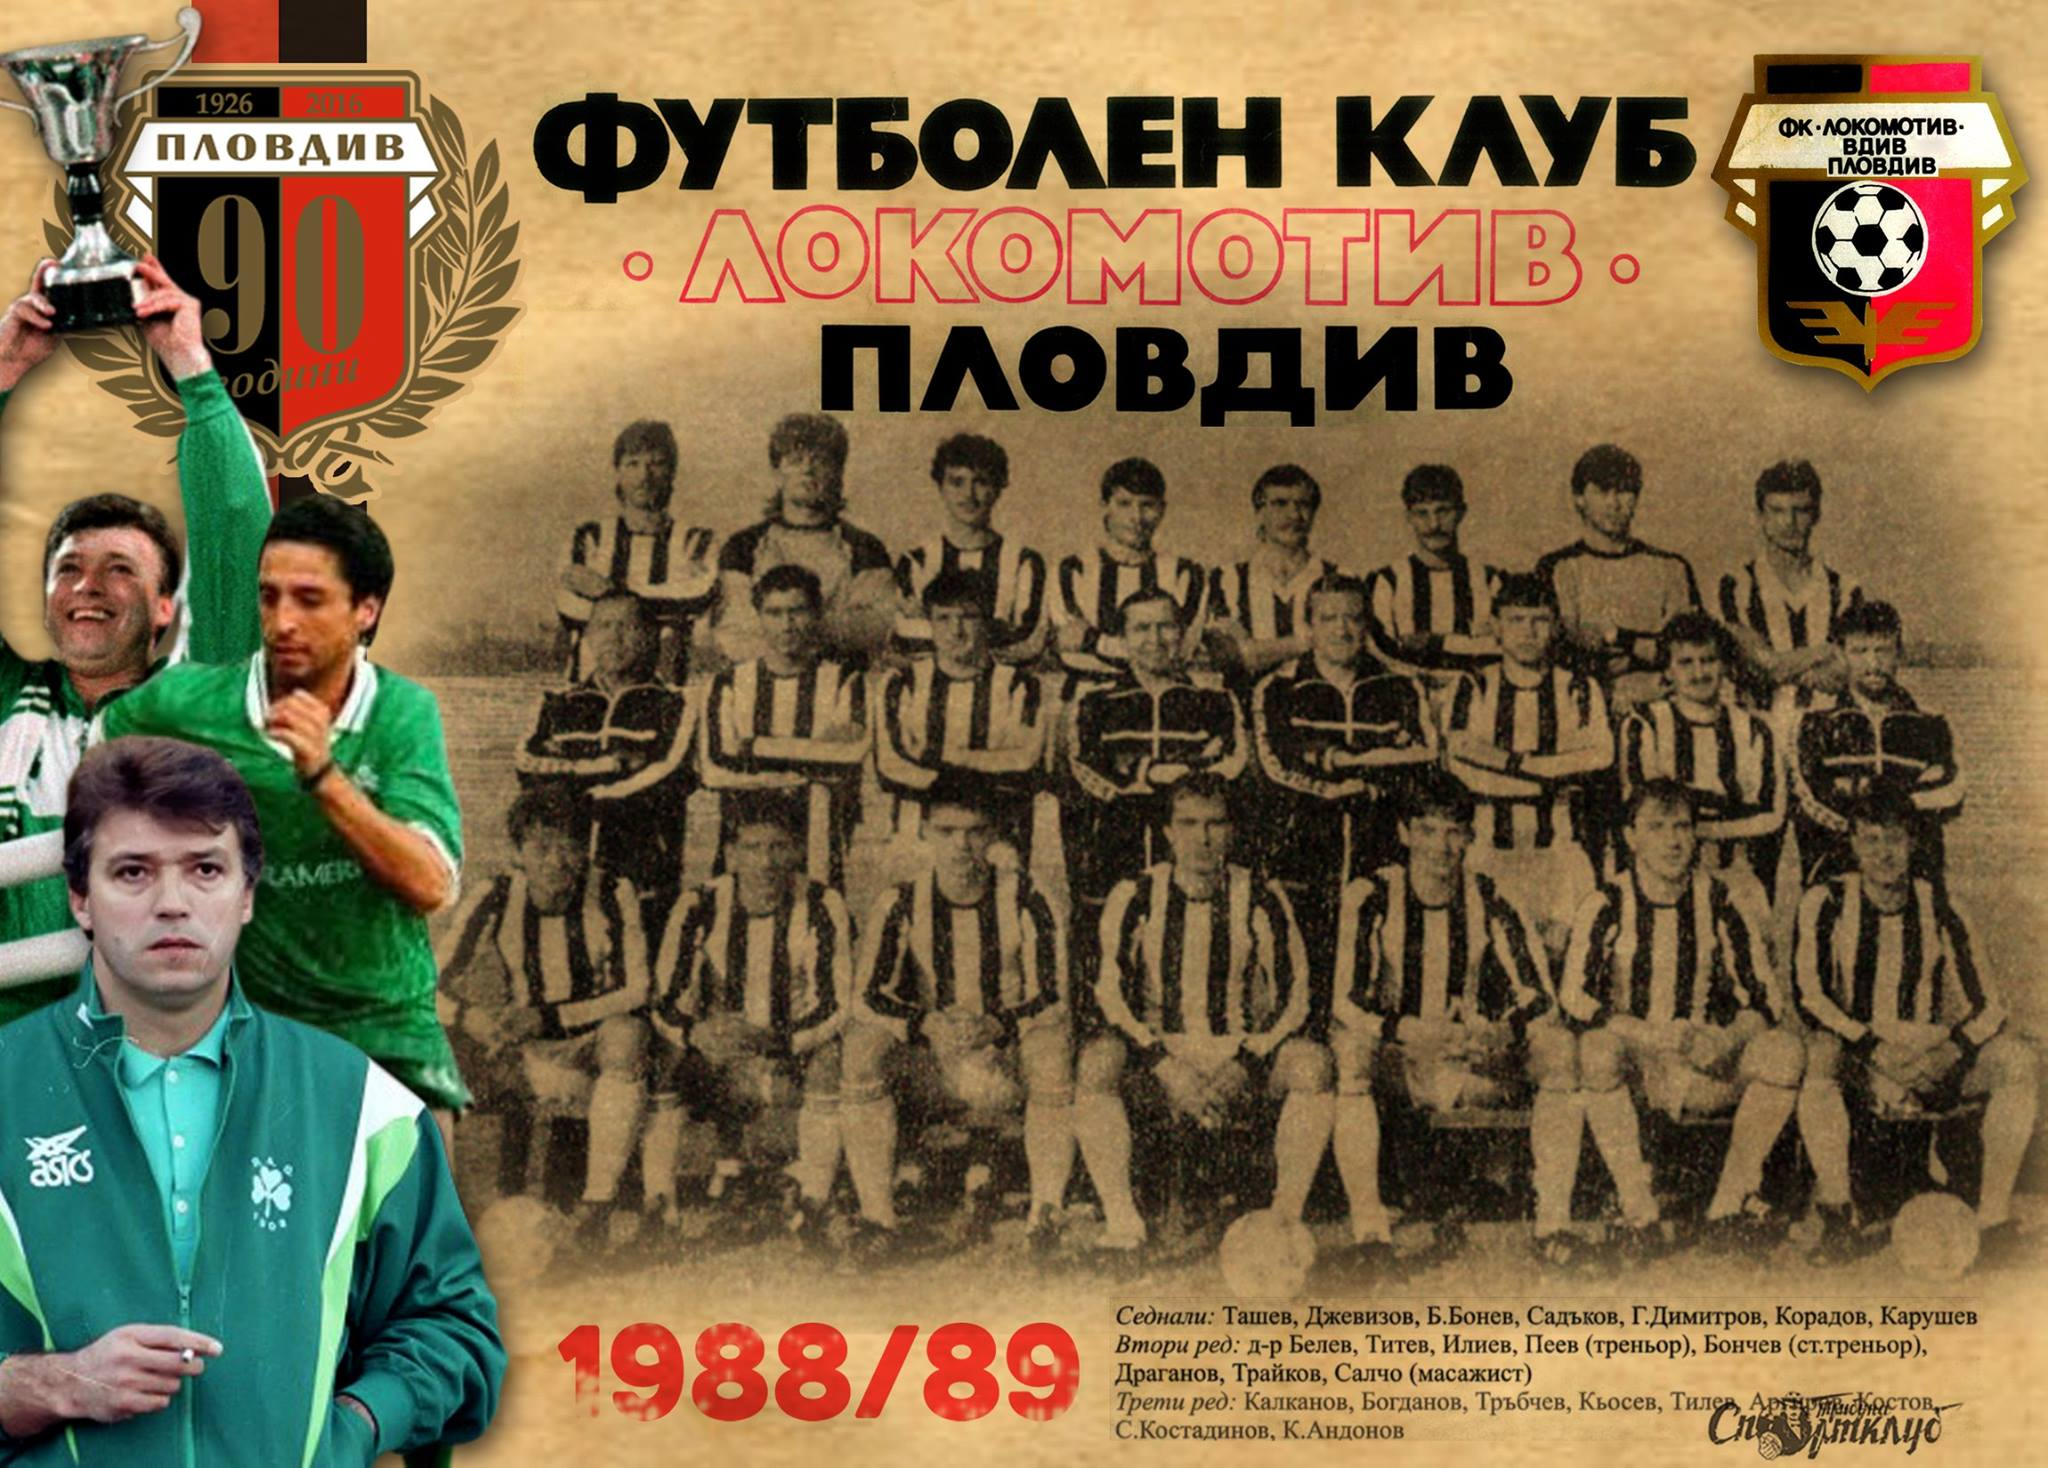 Сезон 1988/89